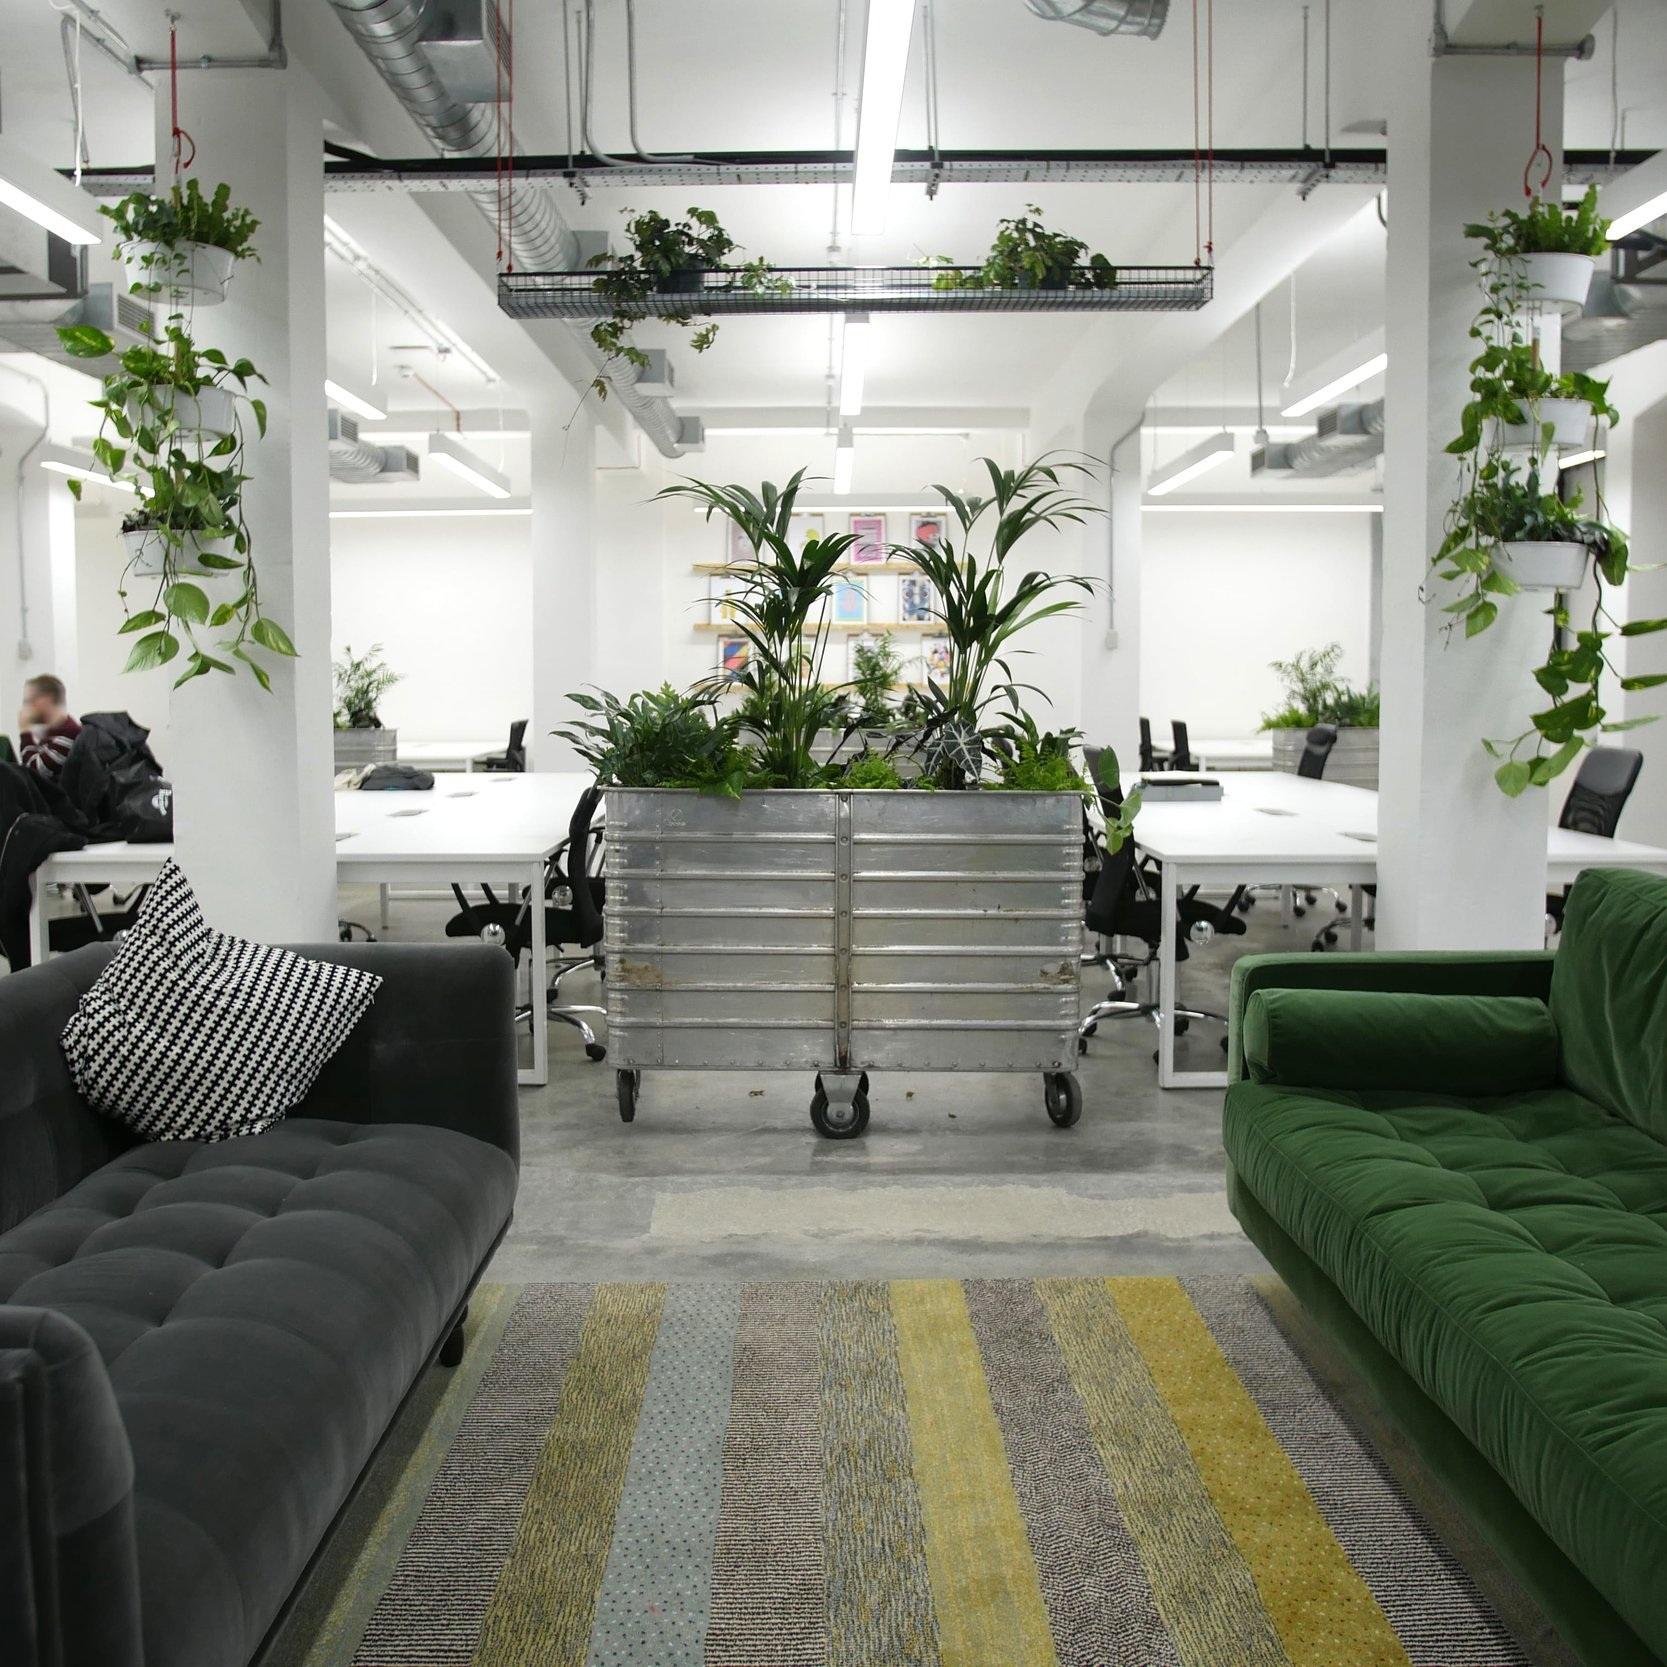 Meristem+Design+interior+planters-min.jpg